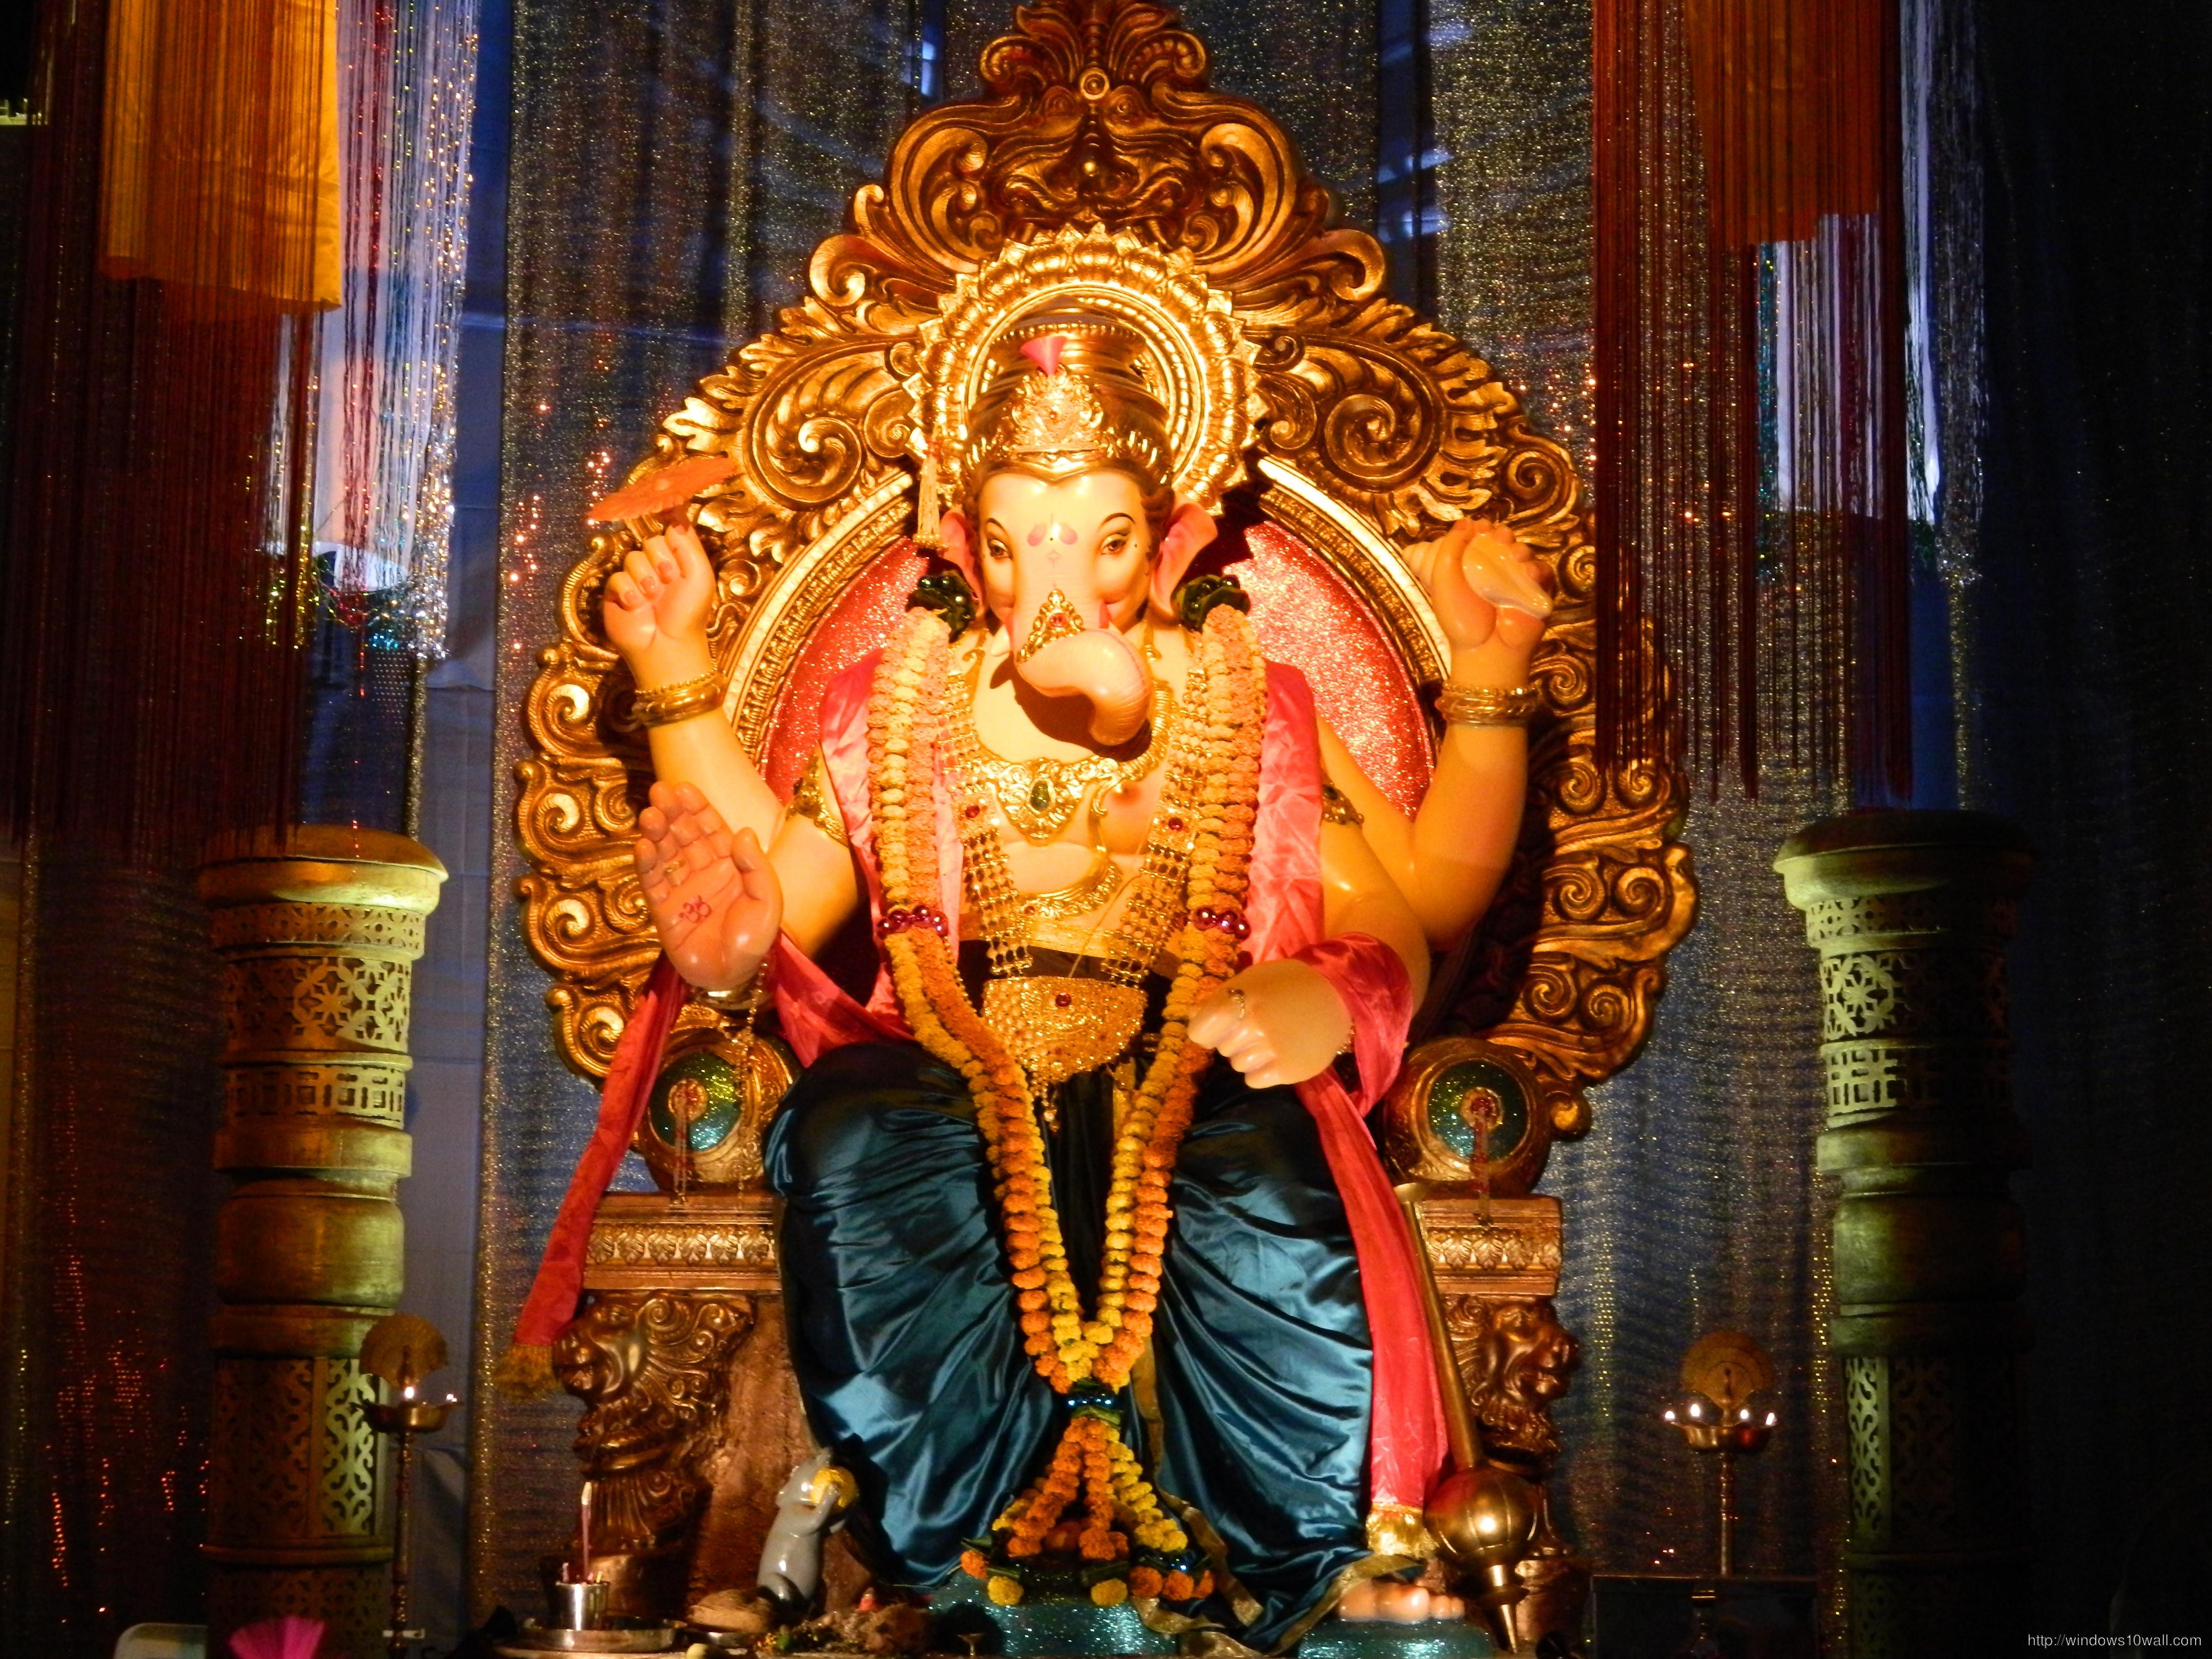 Wallpaper download ganesh - Lord Ganesha Wallpaper For Good Morning